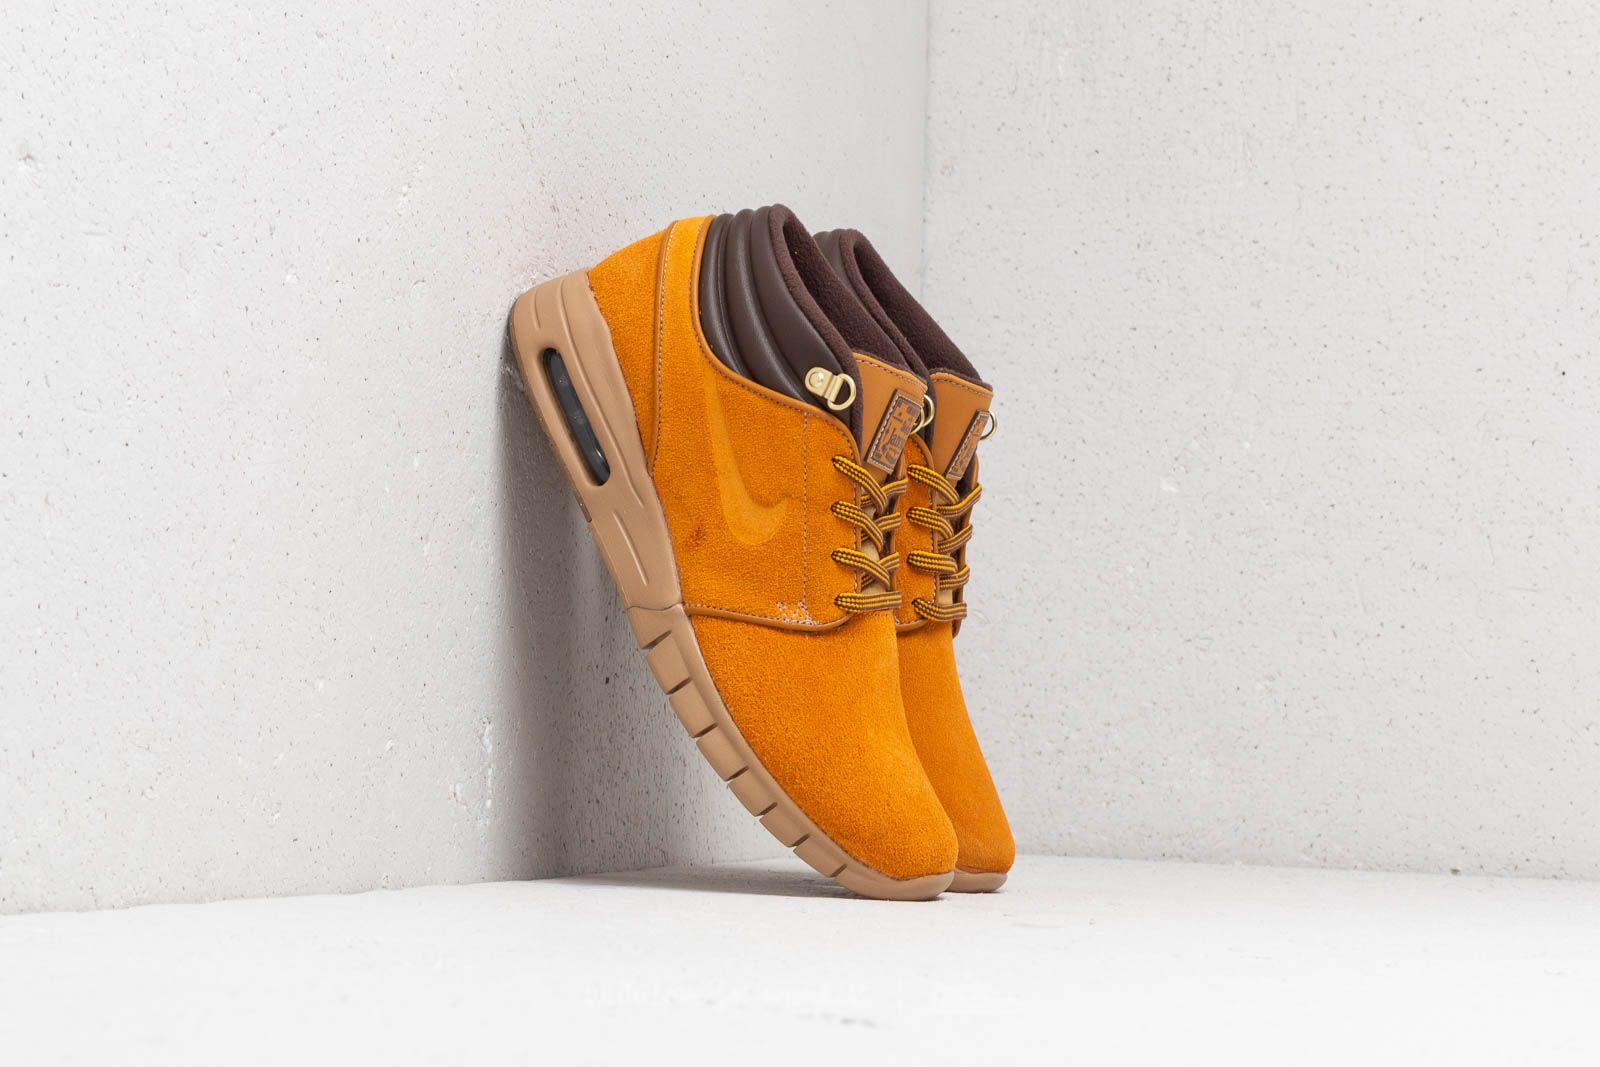 63f3ad5974 Nike Stefan Janoski Max Mid Premium Bronze/ Bronze-Gum Light Brown ...